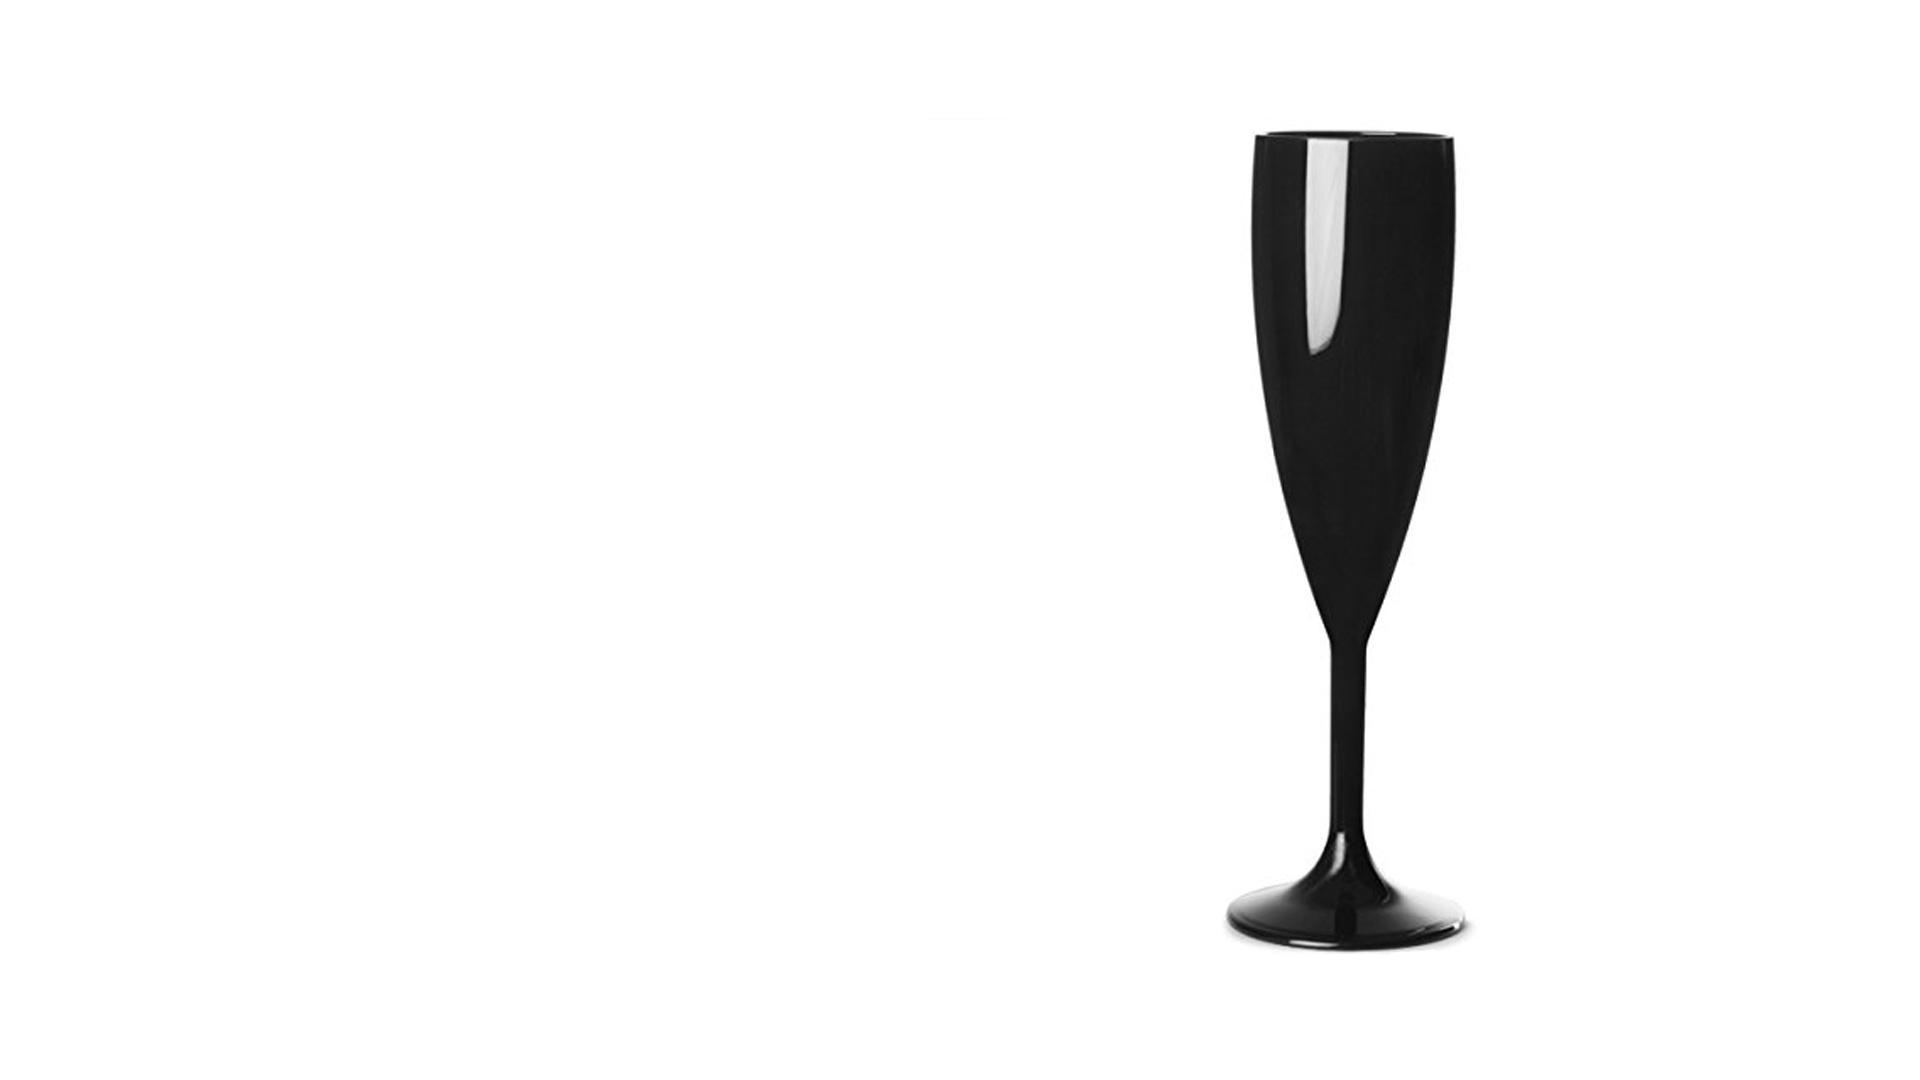 Black Champagne Flute - Big Brother 2017